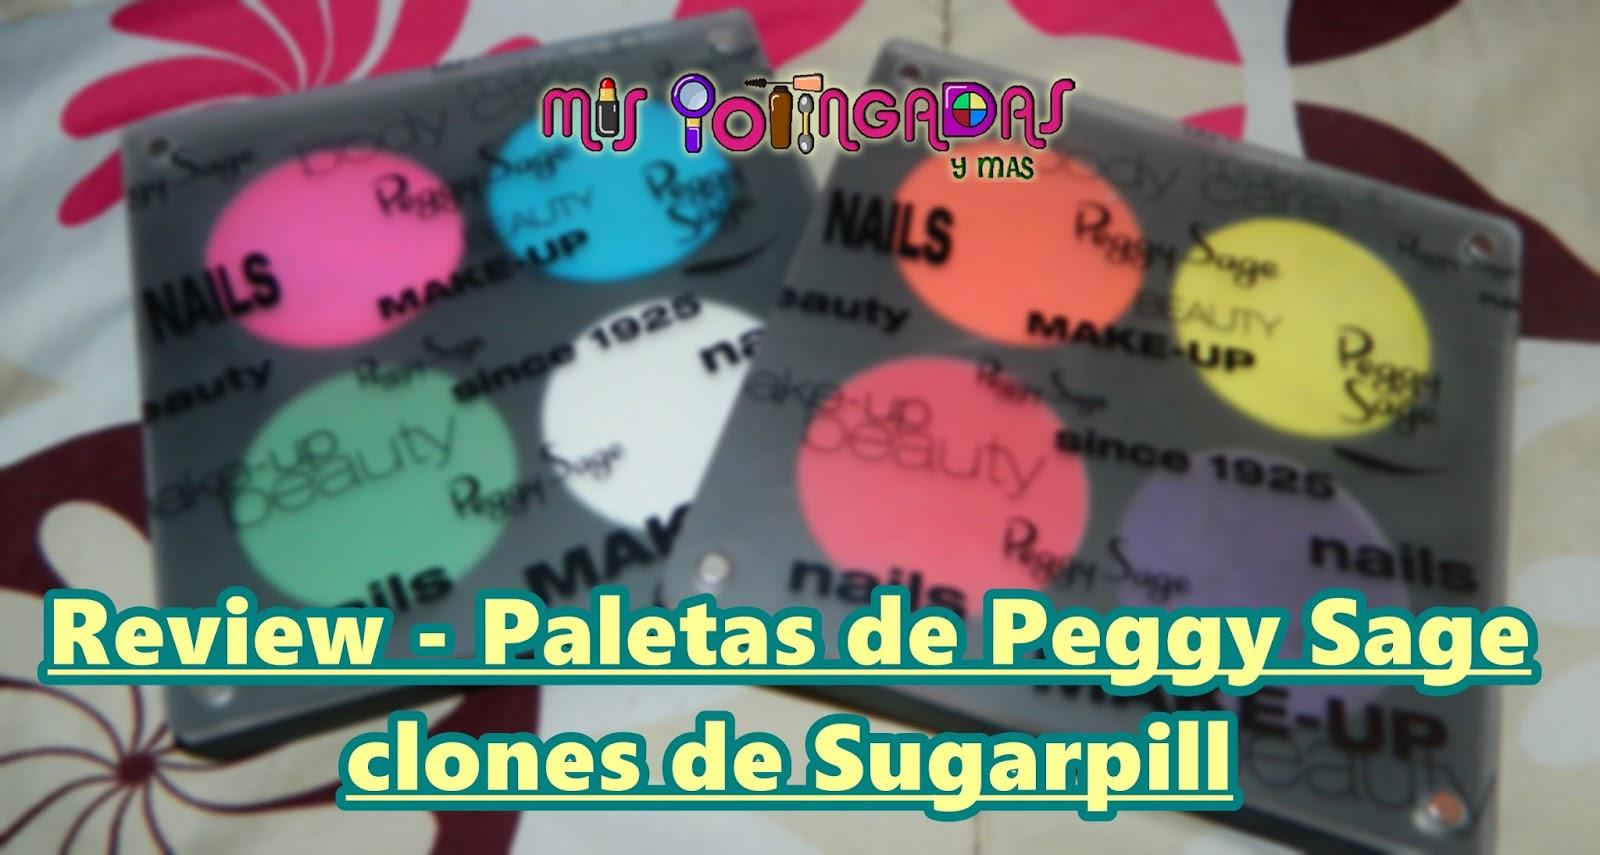 Review - Paletas de Peggy Sage clones de Sugarpill